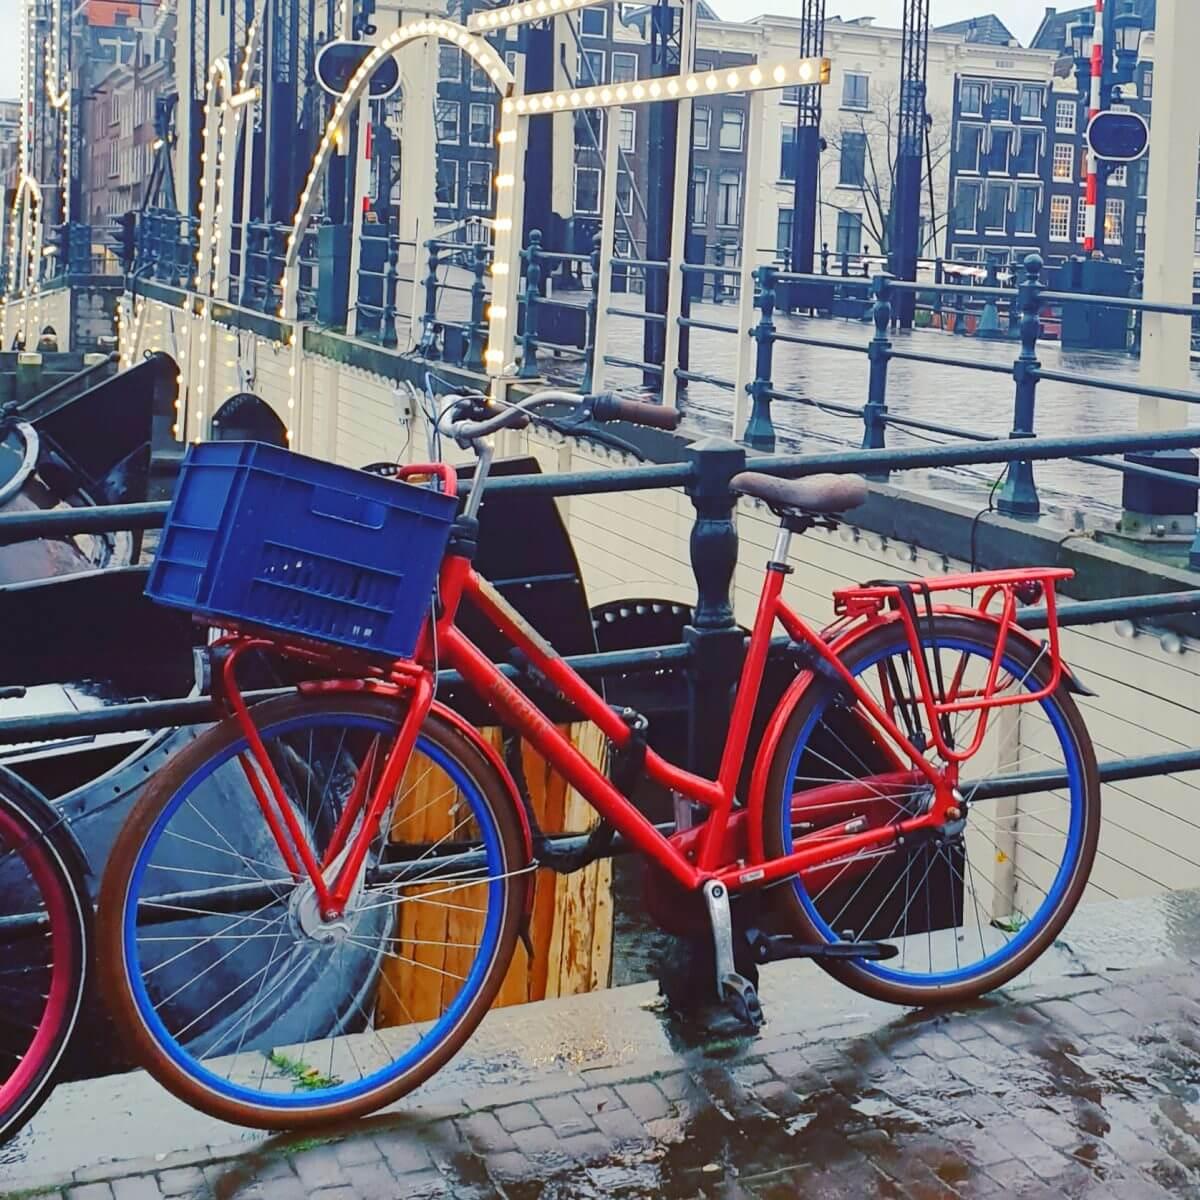 De Magere brug over de de Amstel in Amsterdam